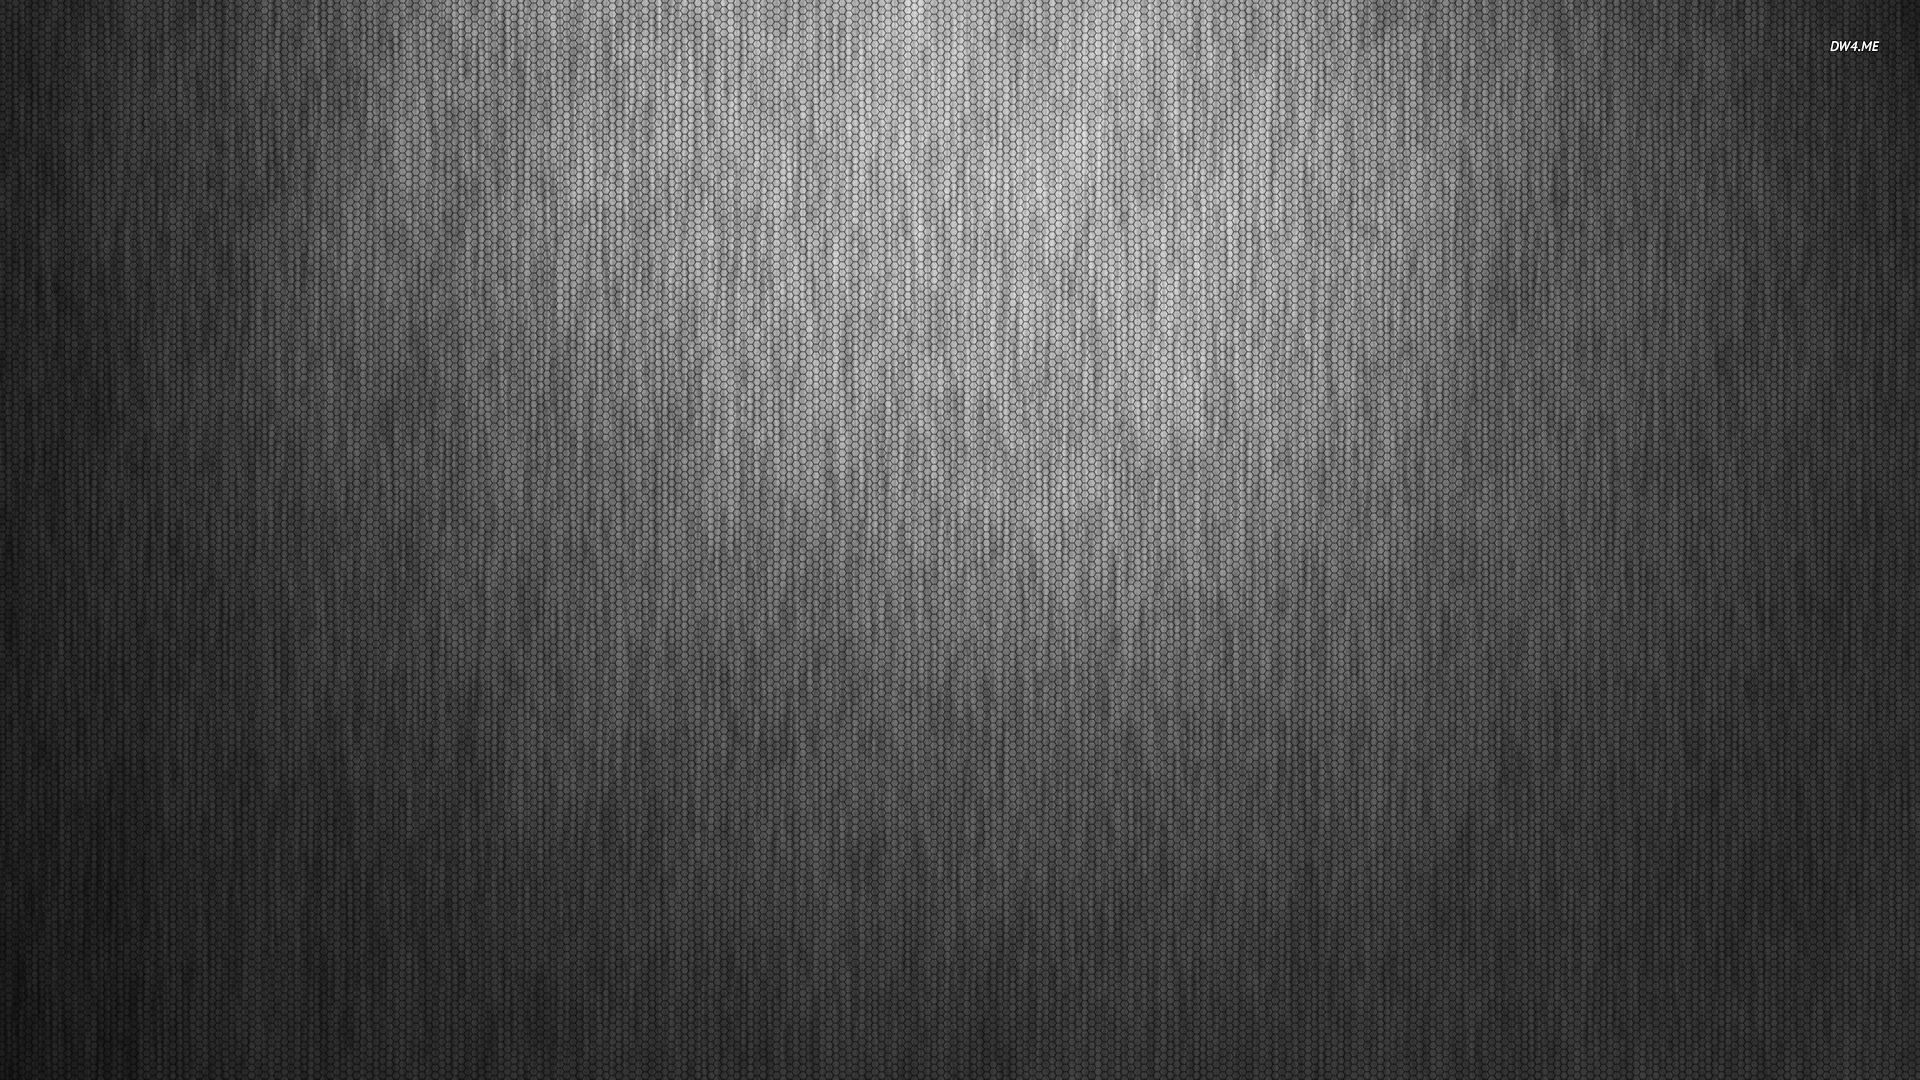 Metallic mesh wallpaper   Abstract wallpapers   779 1920x1080